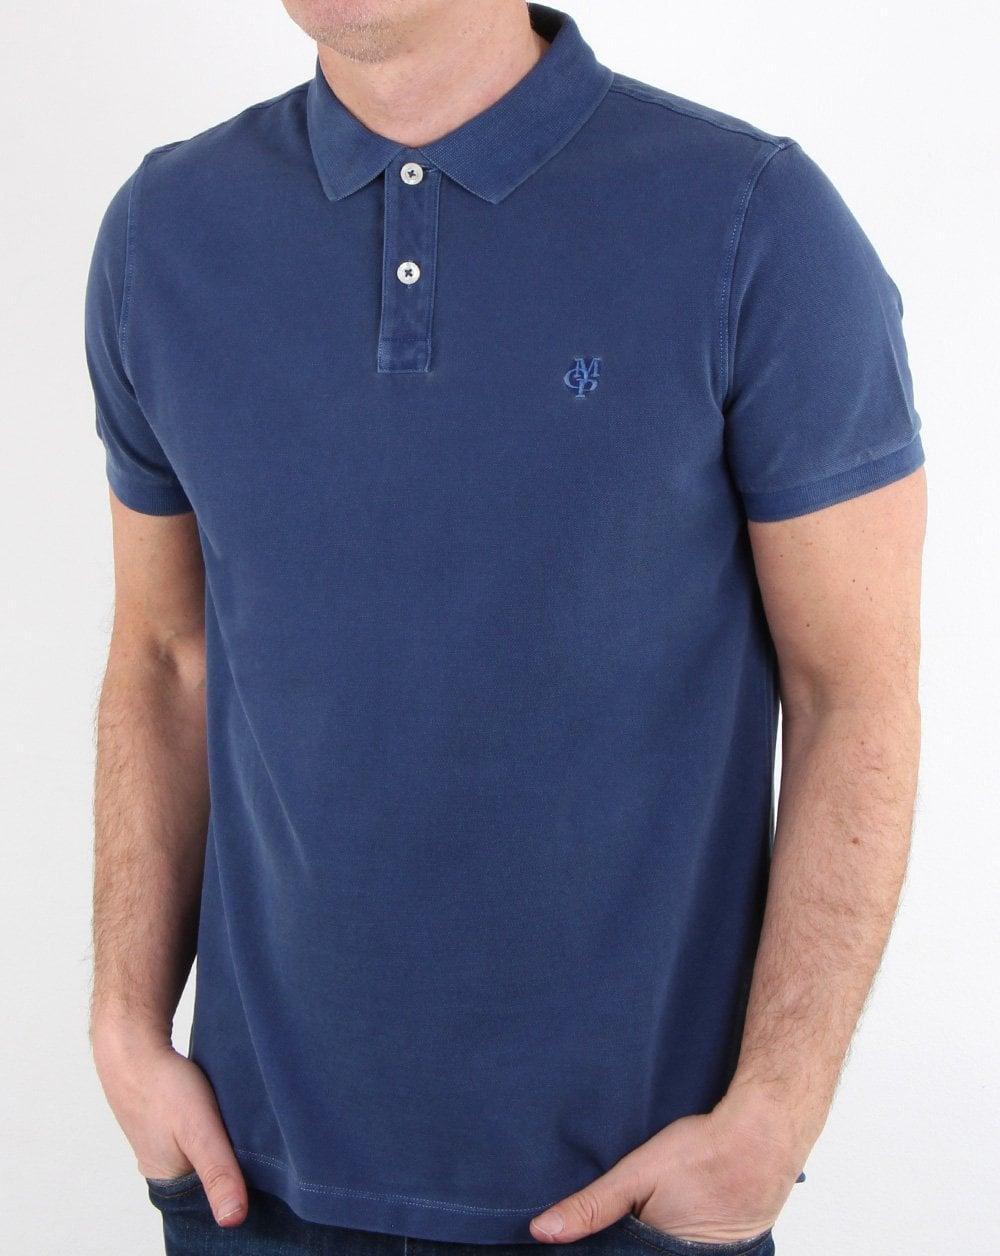 size 40 9f6d4 addbe Marc O Polo Polo Shirt Blue